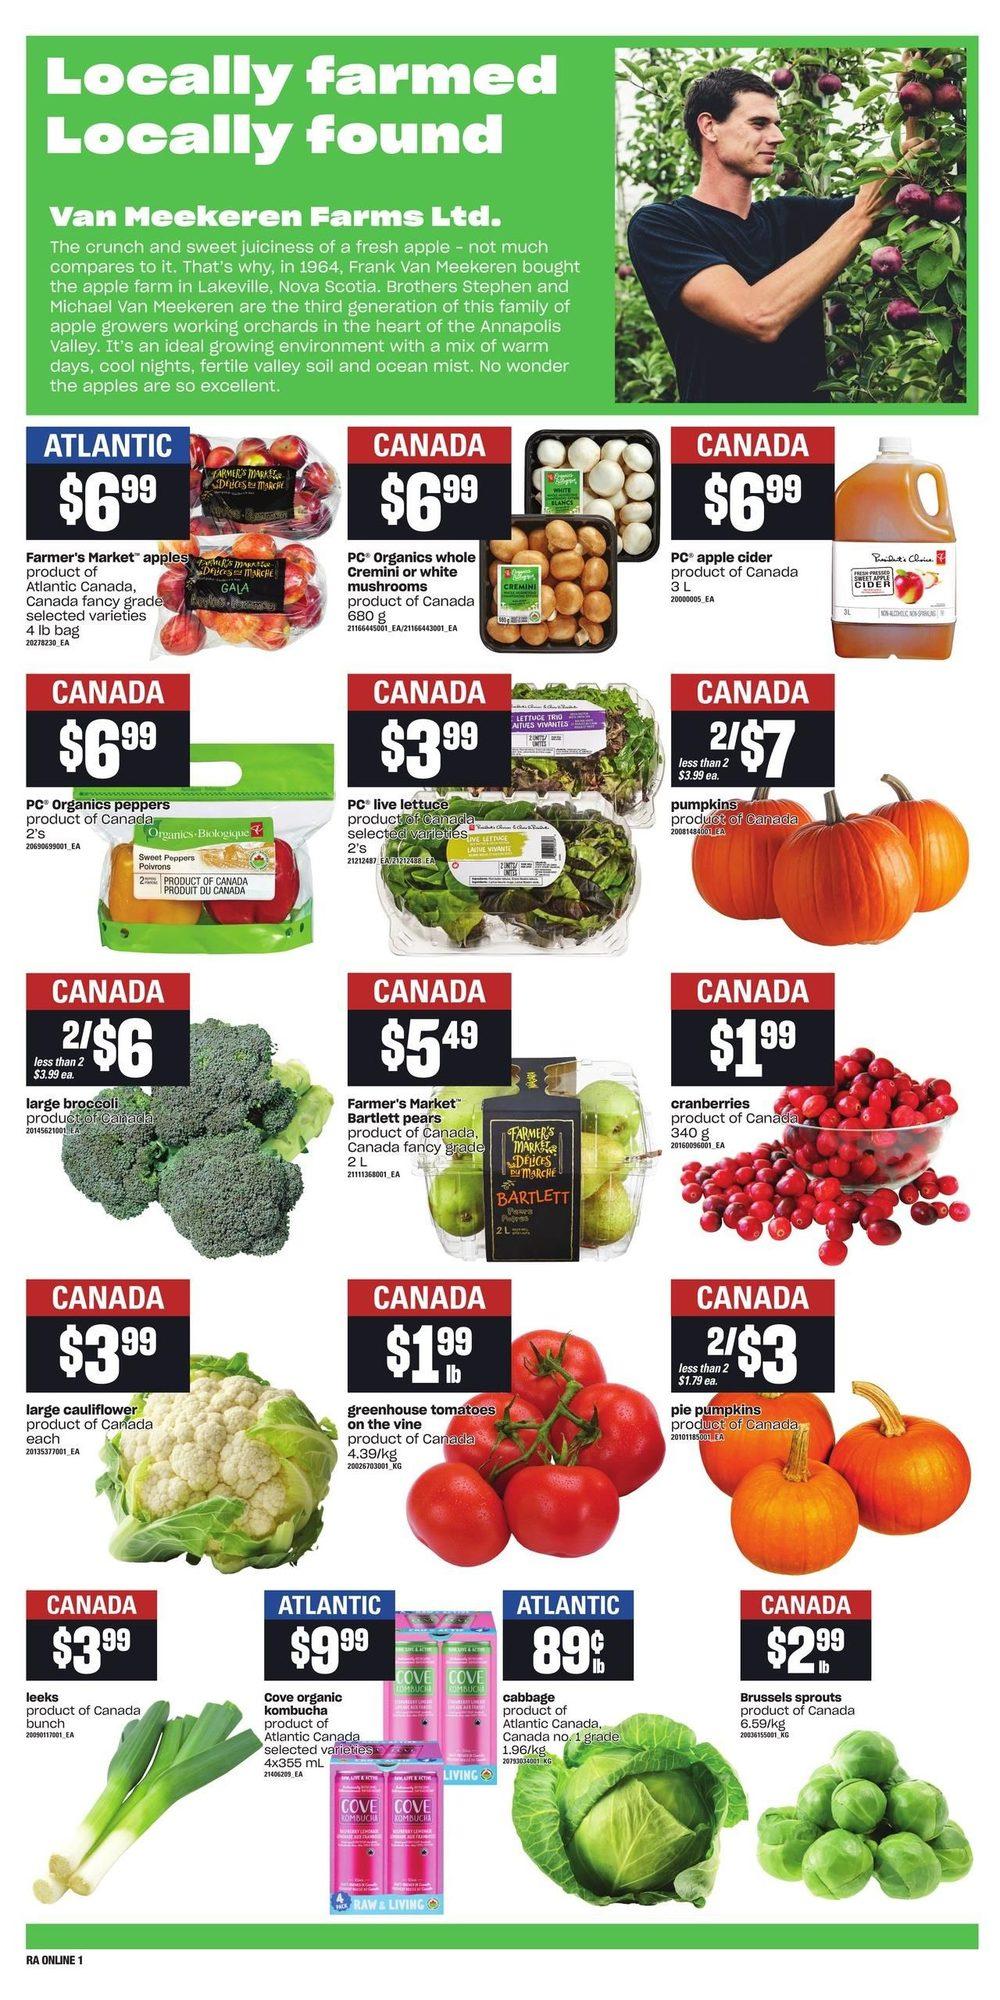 Atlantic Superstore - Weekly Flyer Specials - Page 4